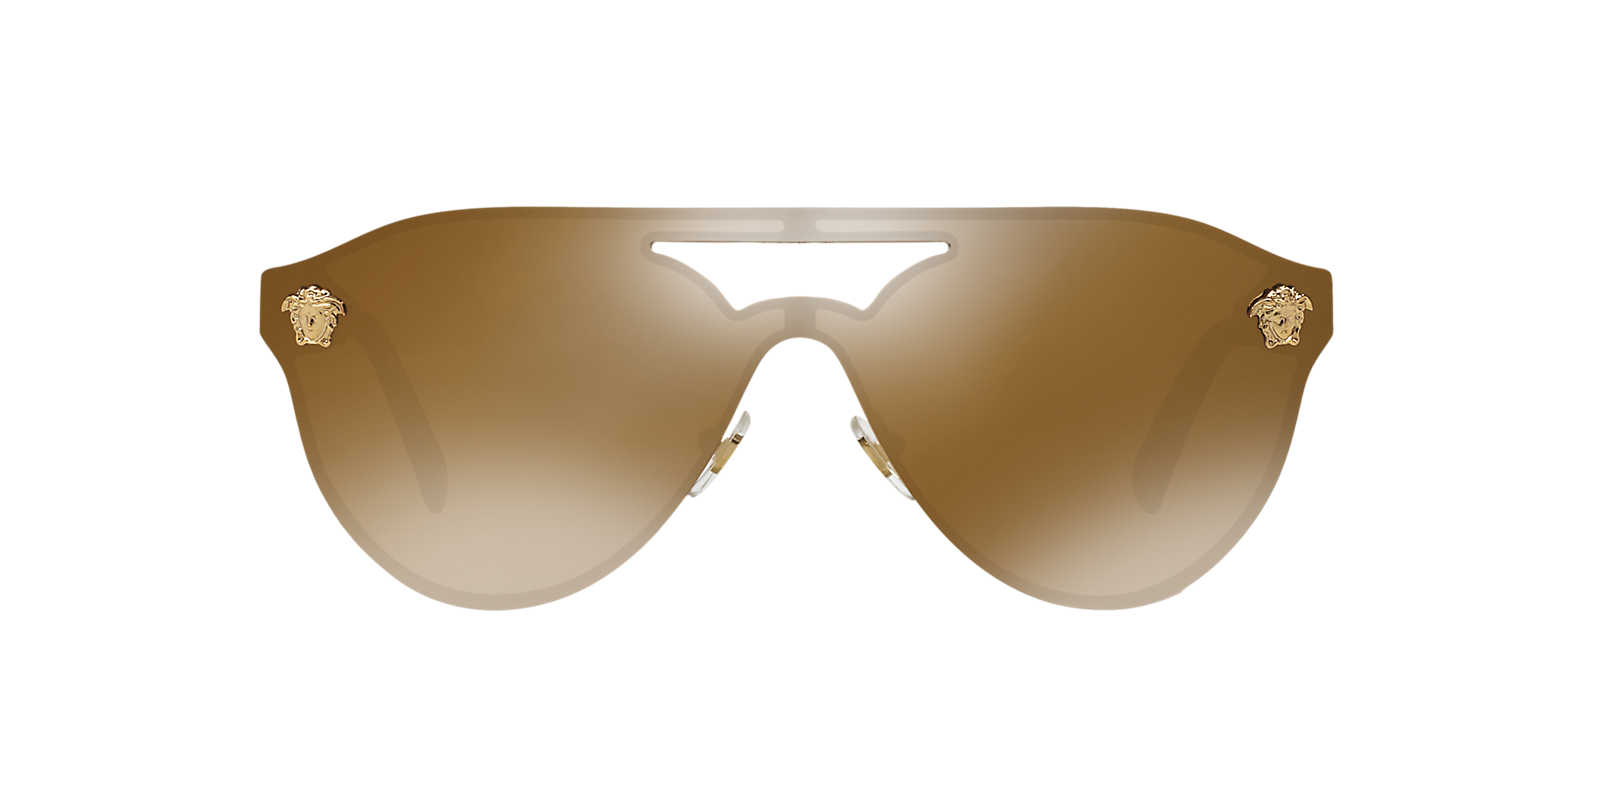 Frame glasses versace - Ve2161 Ve2161 Versace